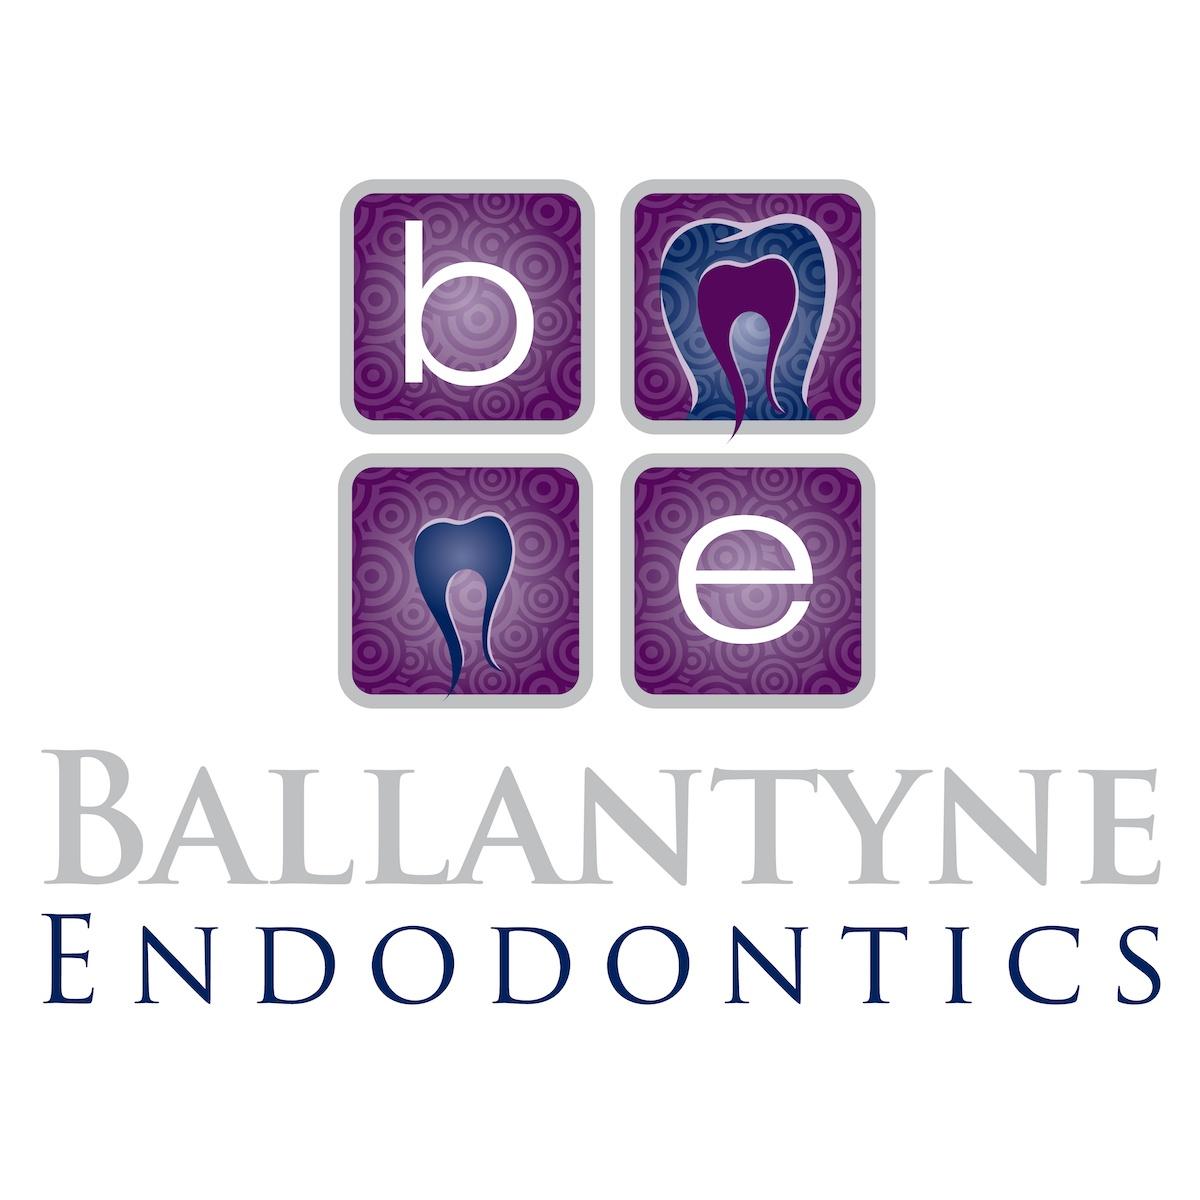 Ballantyne Endodontics logo.jpg